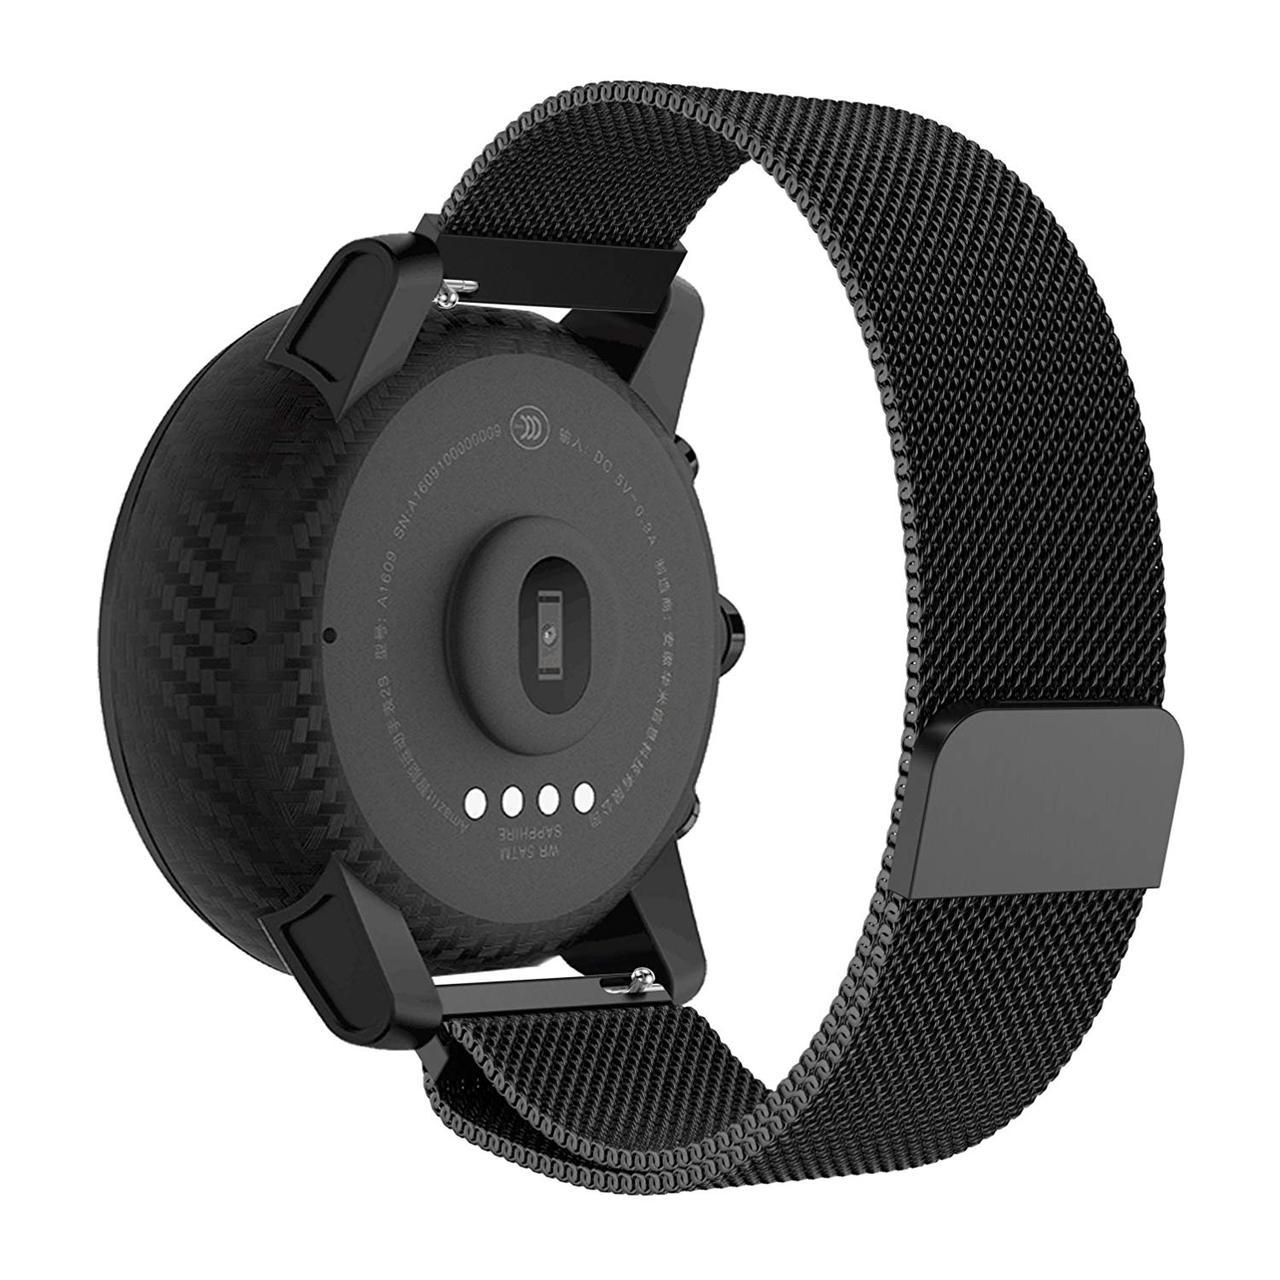 Ремінець BeWatch для Samsung Galaxy Watch 3 45mm міланська петля 22мм стальний Браслет Чорний (1020201)